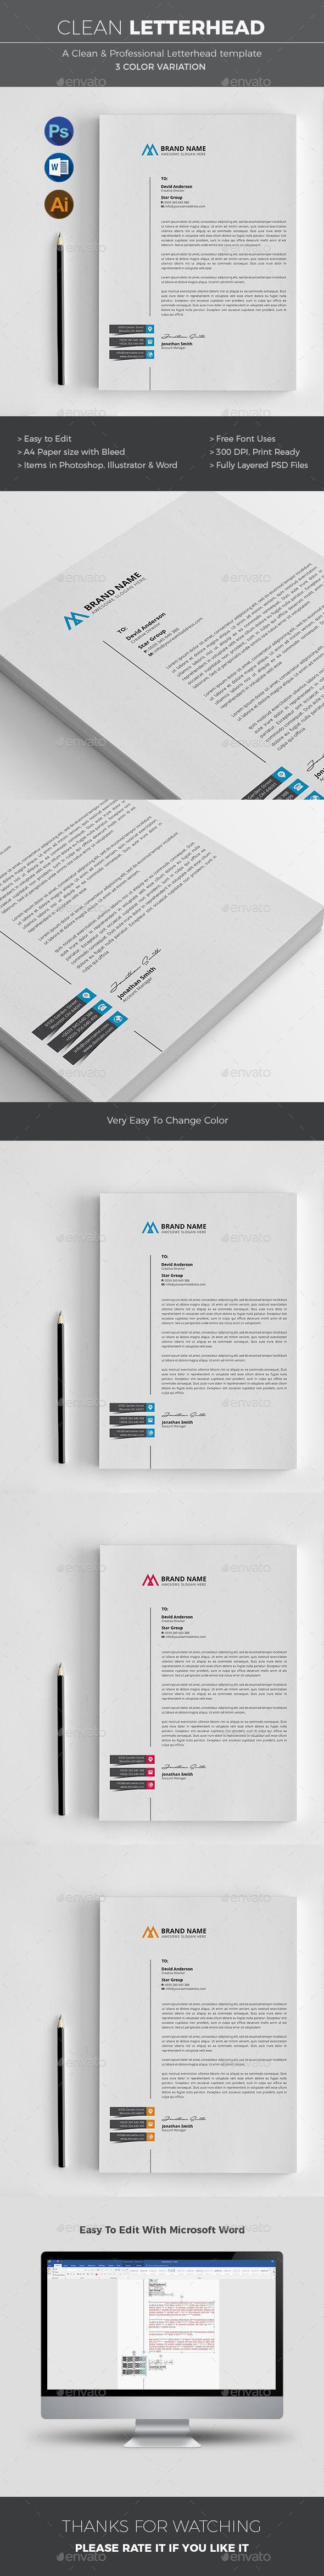 Letterhead Letterhead Stationery printing Print templates